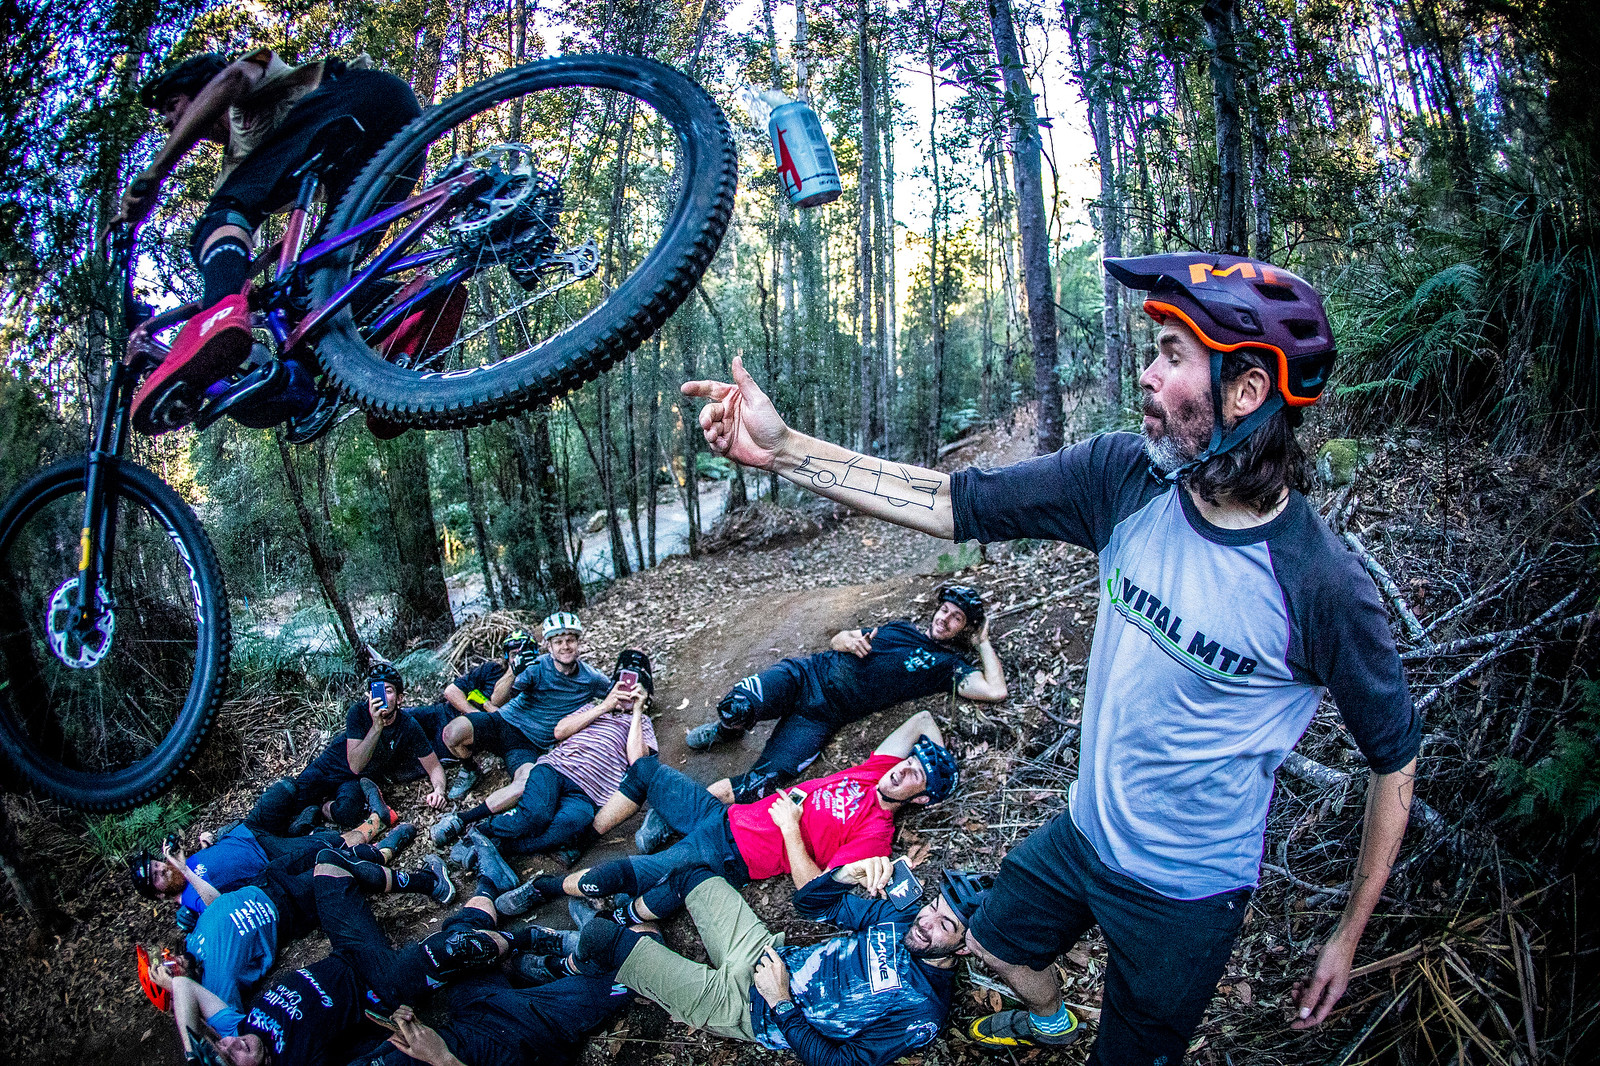 Officially Unsanctioned Enduro World Series Vertigo MTB / Moo Beer / Vital Whip-Off - Officially Unsanctioned Enduro World Series Vertigo MTB / Moo Beer / Vital Whip-Off - Mountain Biking Pictures - Vital MTB